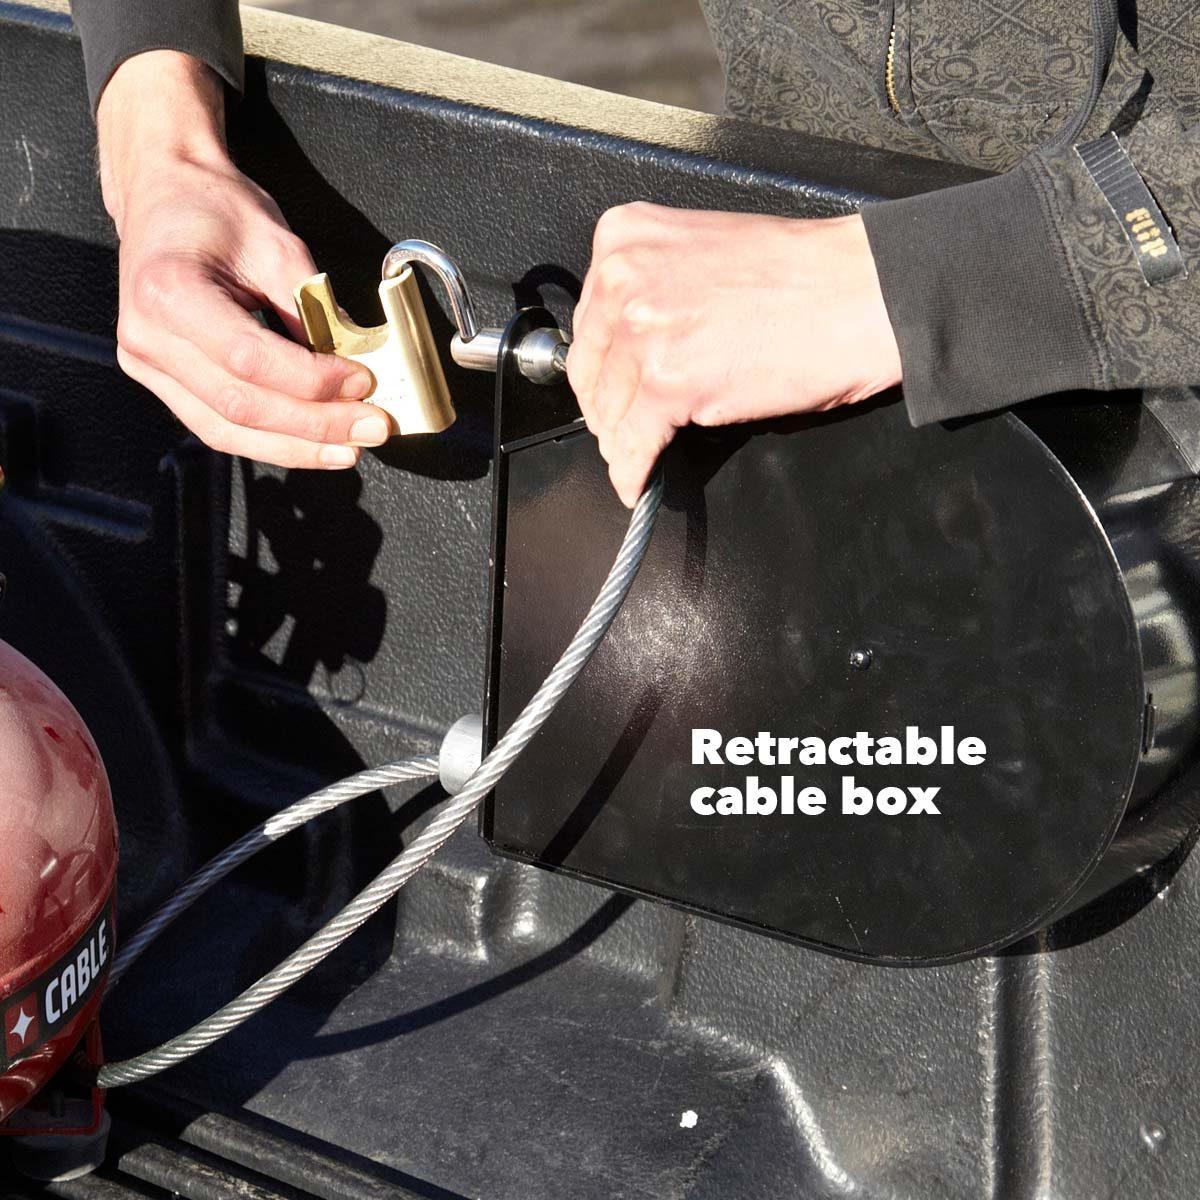 FH12MAR_526_13_035-1200 retractable cable box